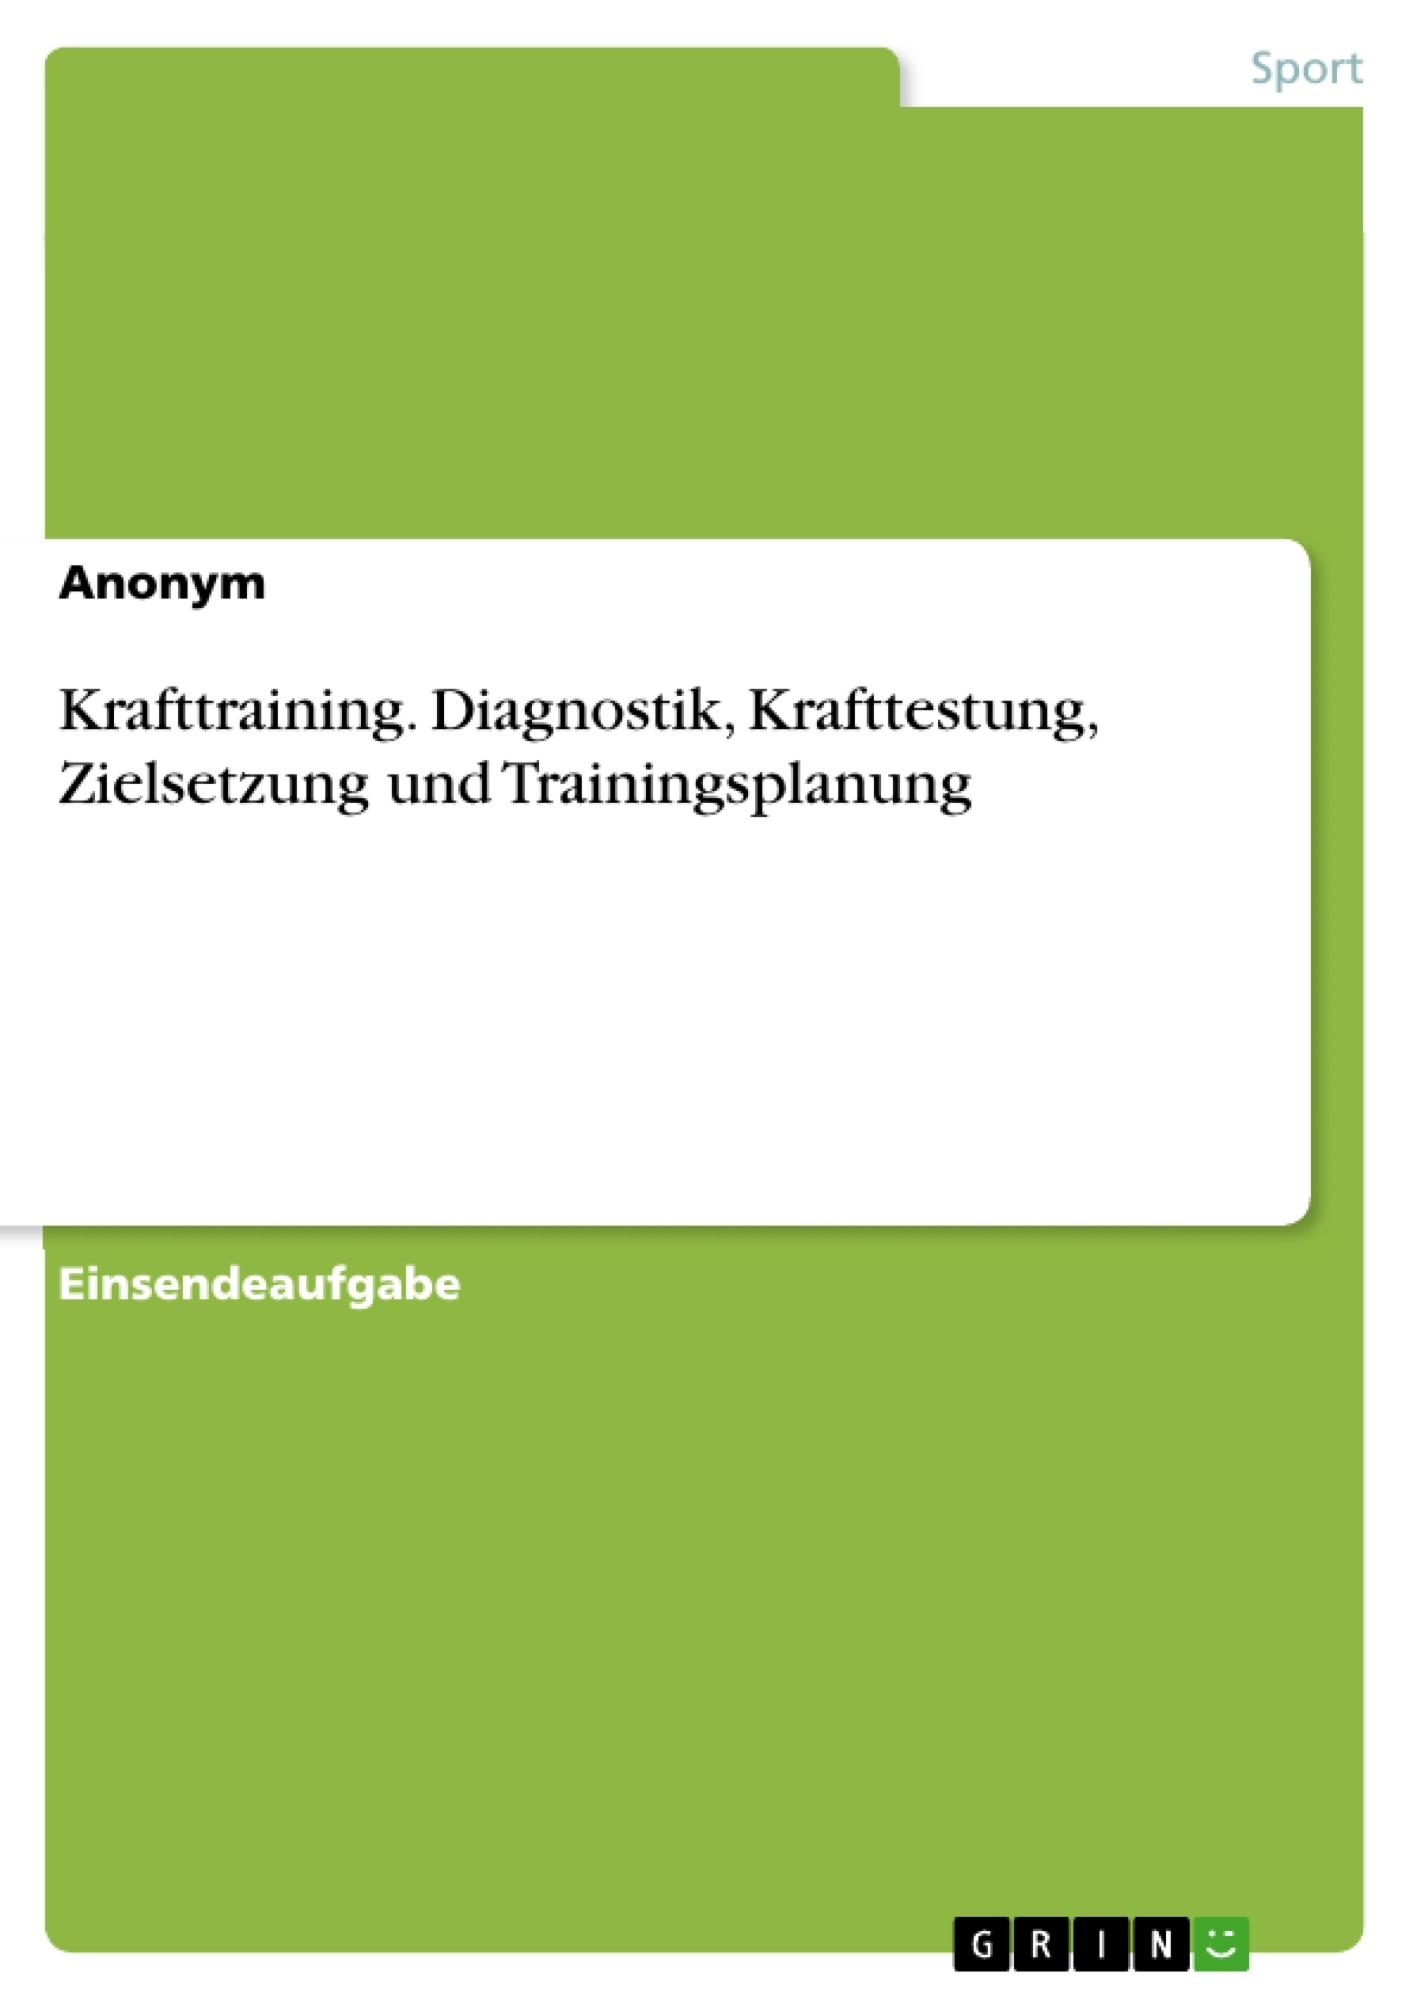 Titel: Krafttraining. Diagnostik, Krafttestung, Zielsetzung und Trainingsplanung